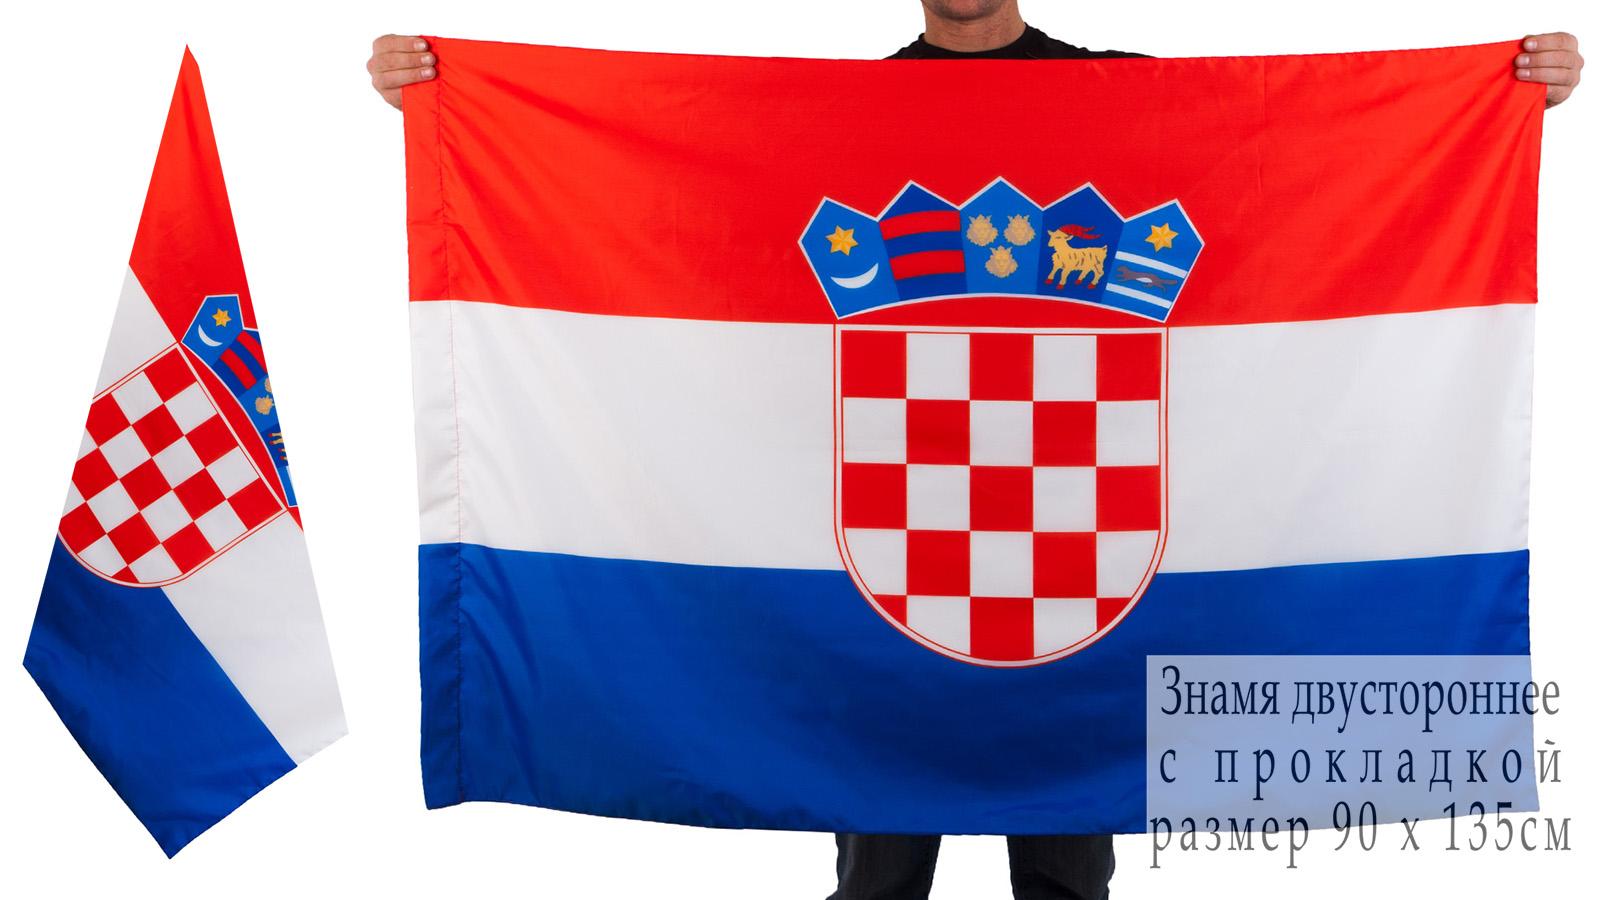 Хорватский флаг двухсторонний